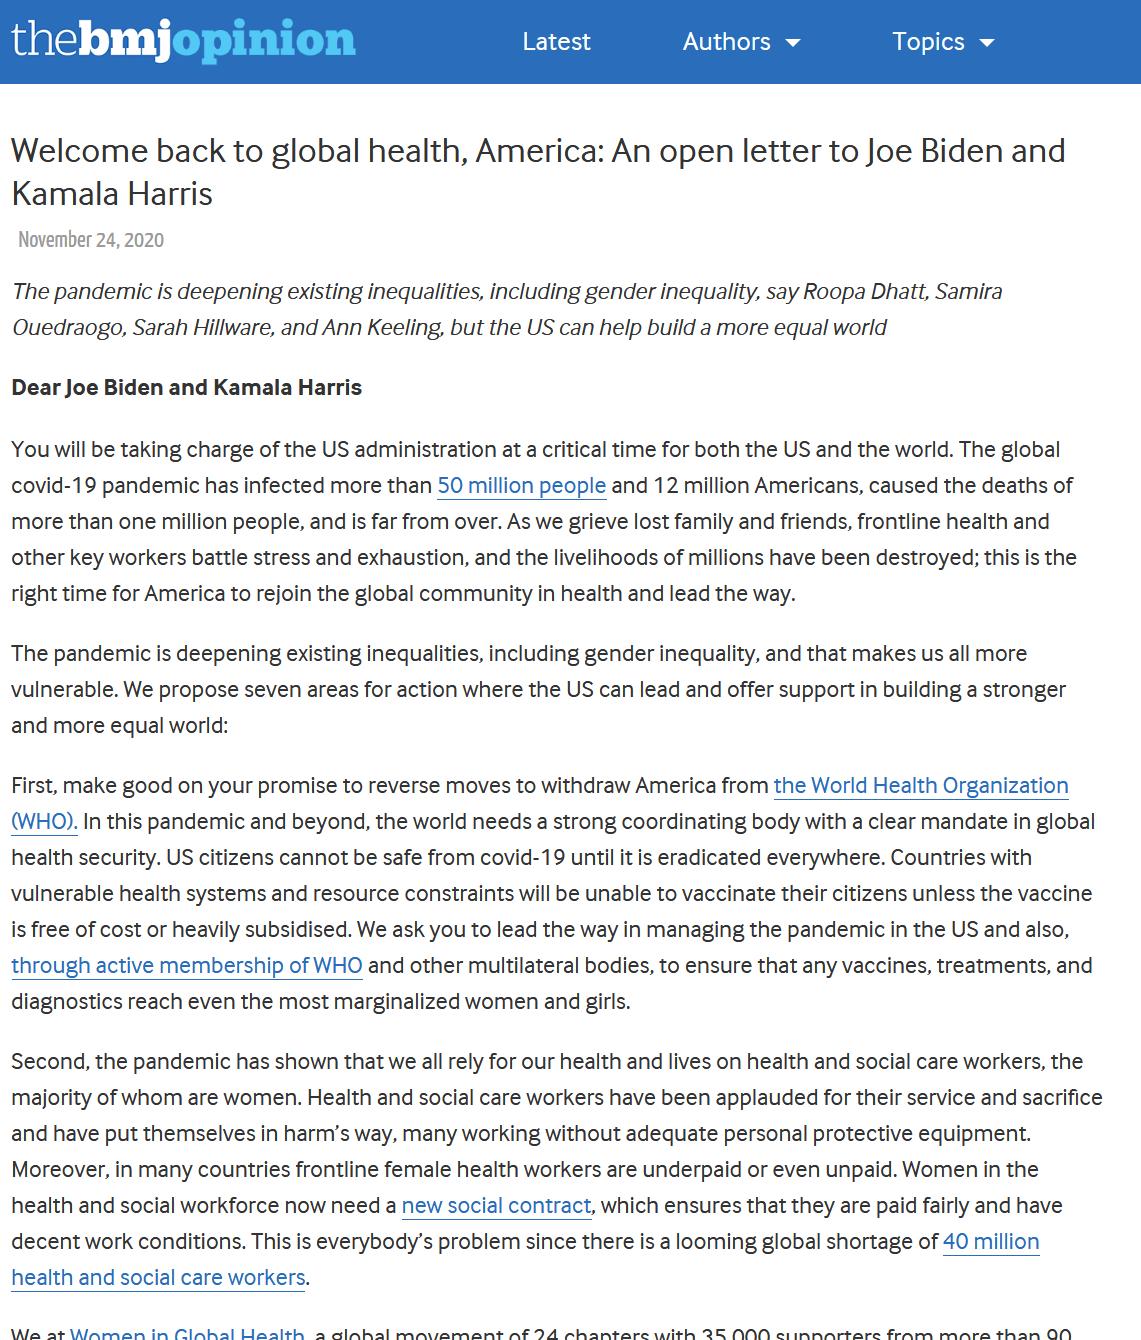 Welcome back to global health, America An open letter to Joe Biden and Kamala Harris